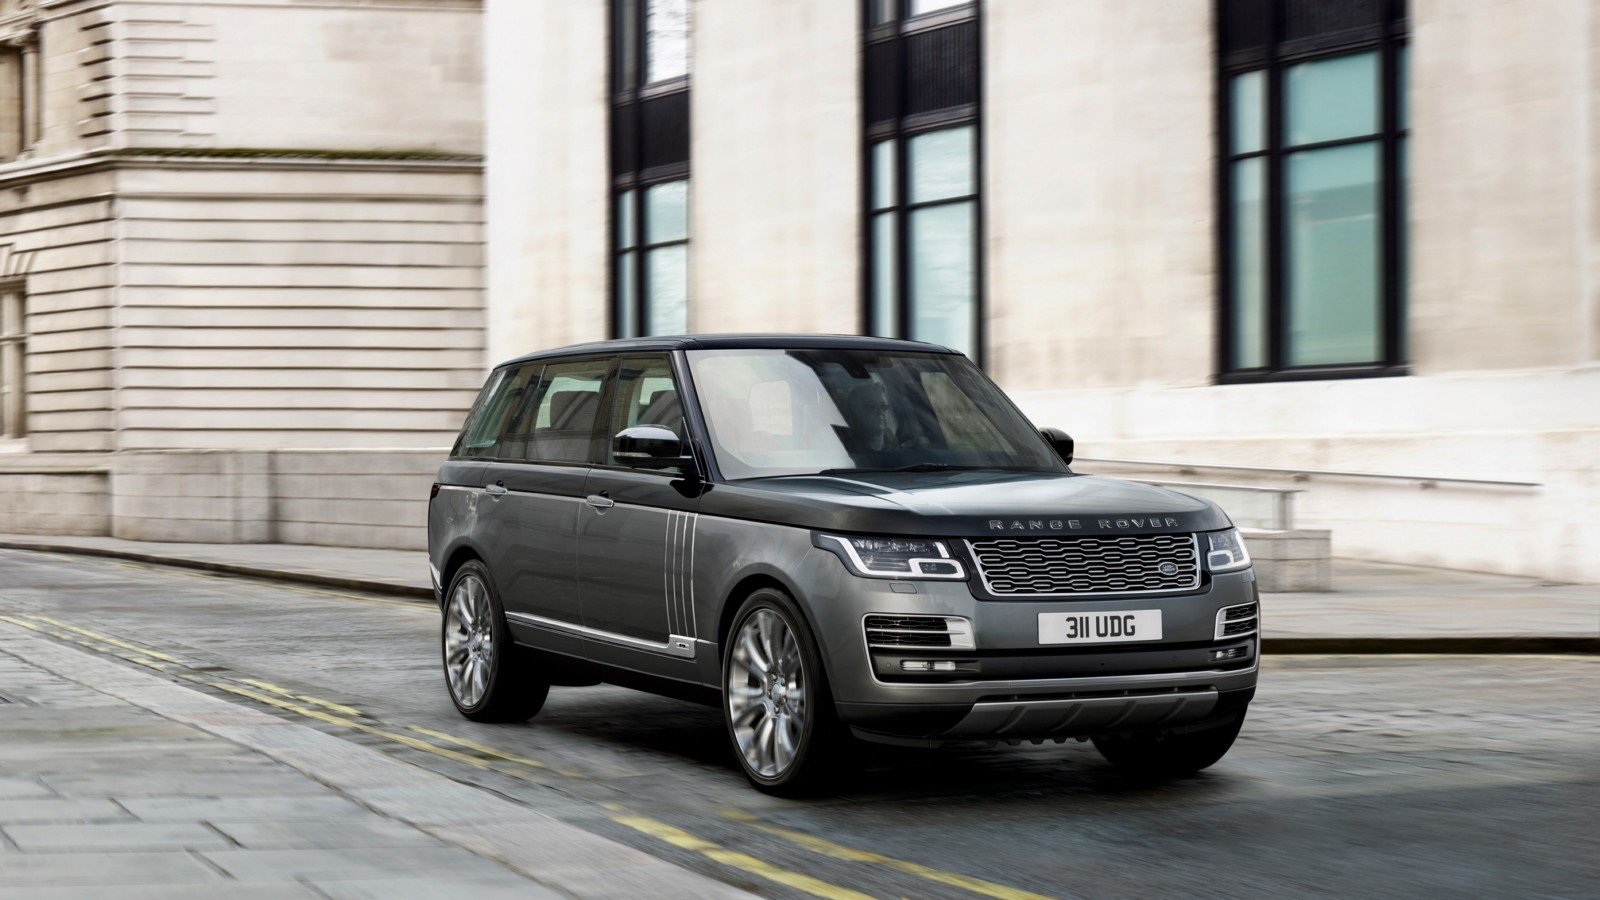 Range Rover SVAutobiography LWB